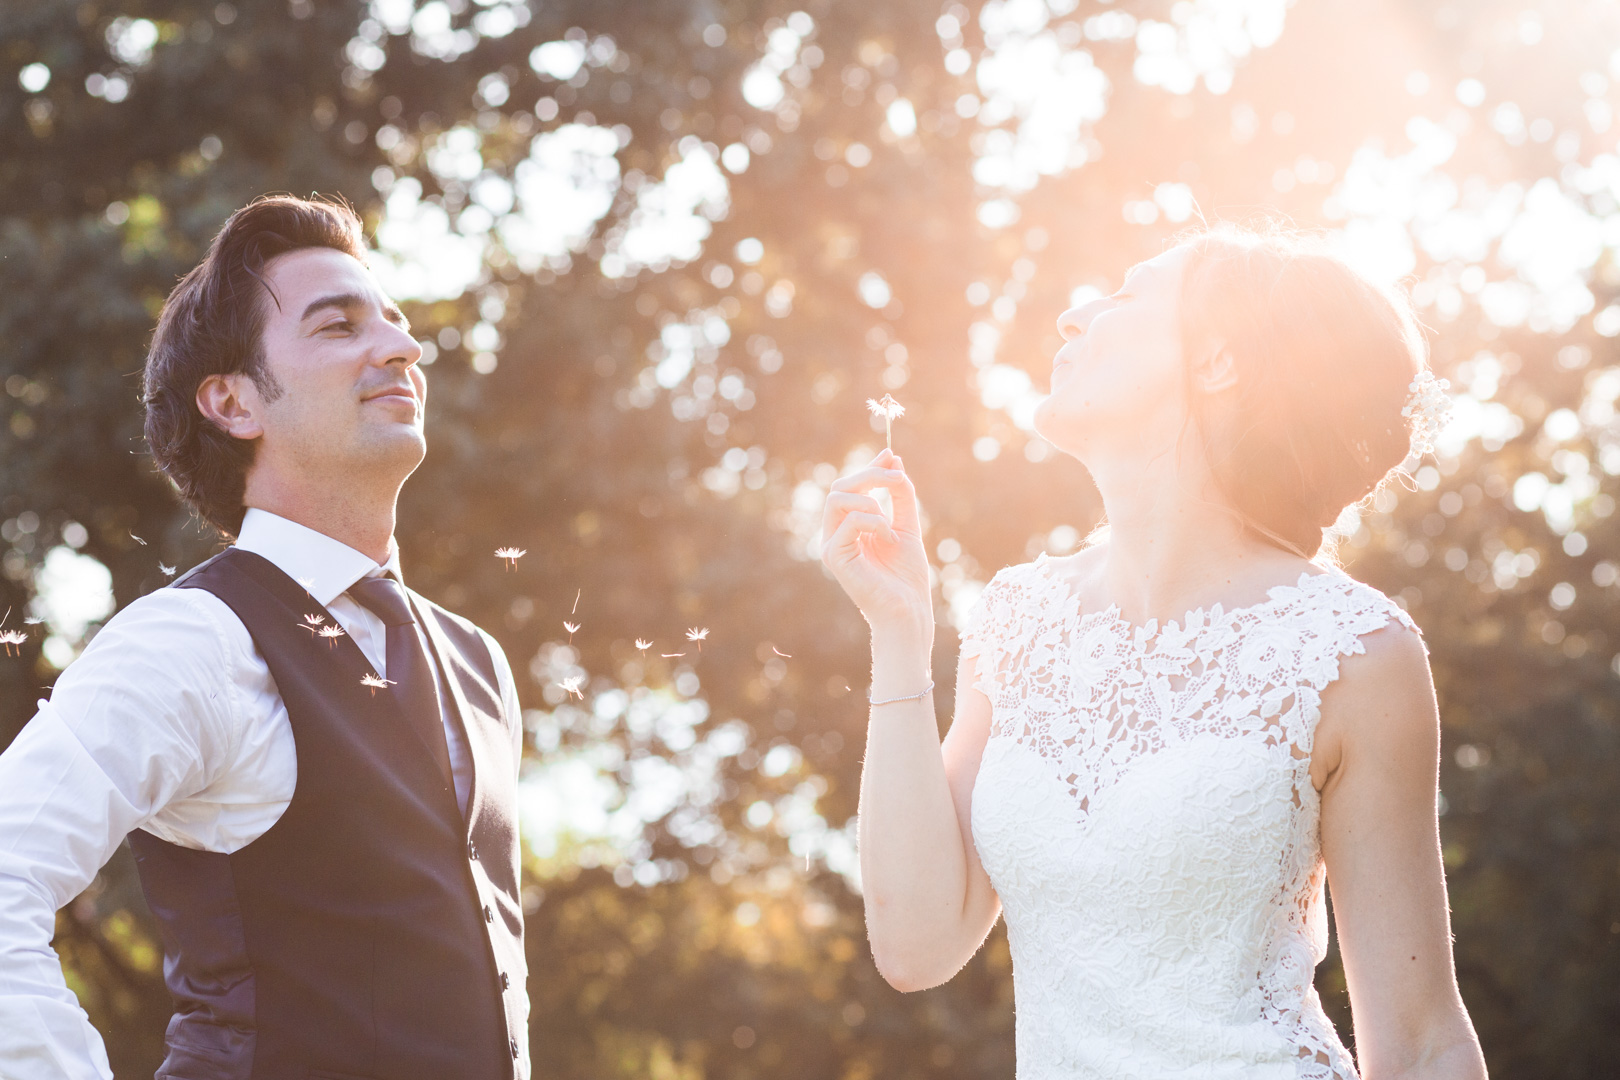 Andreas_Pinacci_Wedding_Photographer-37.